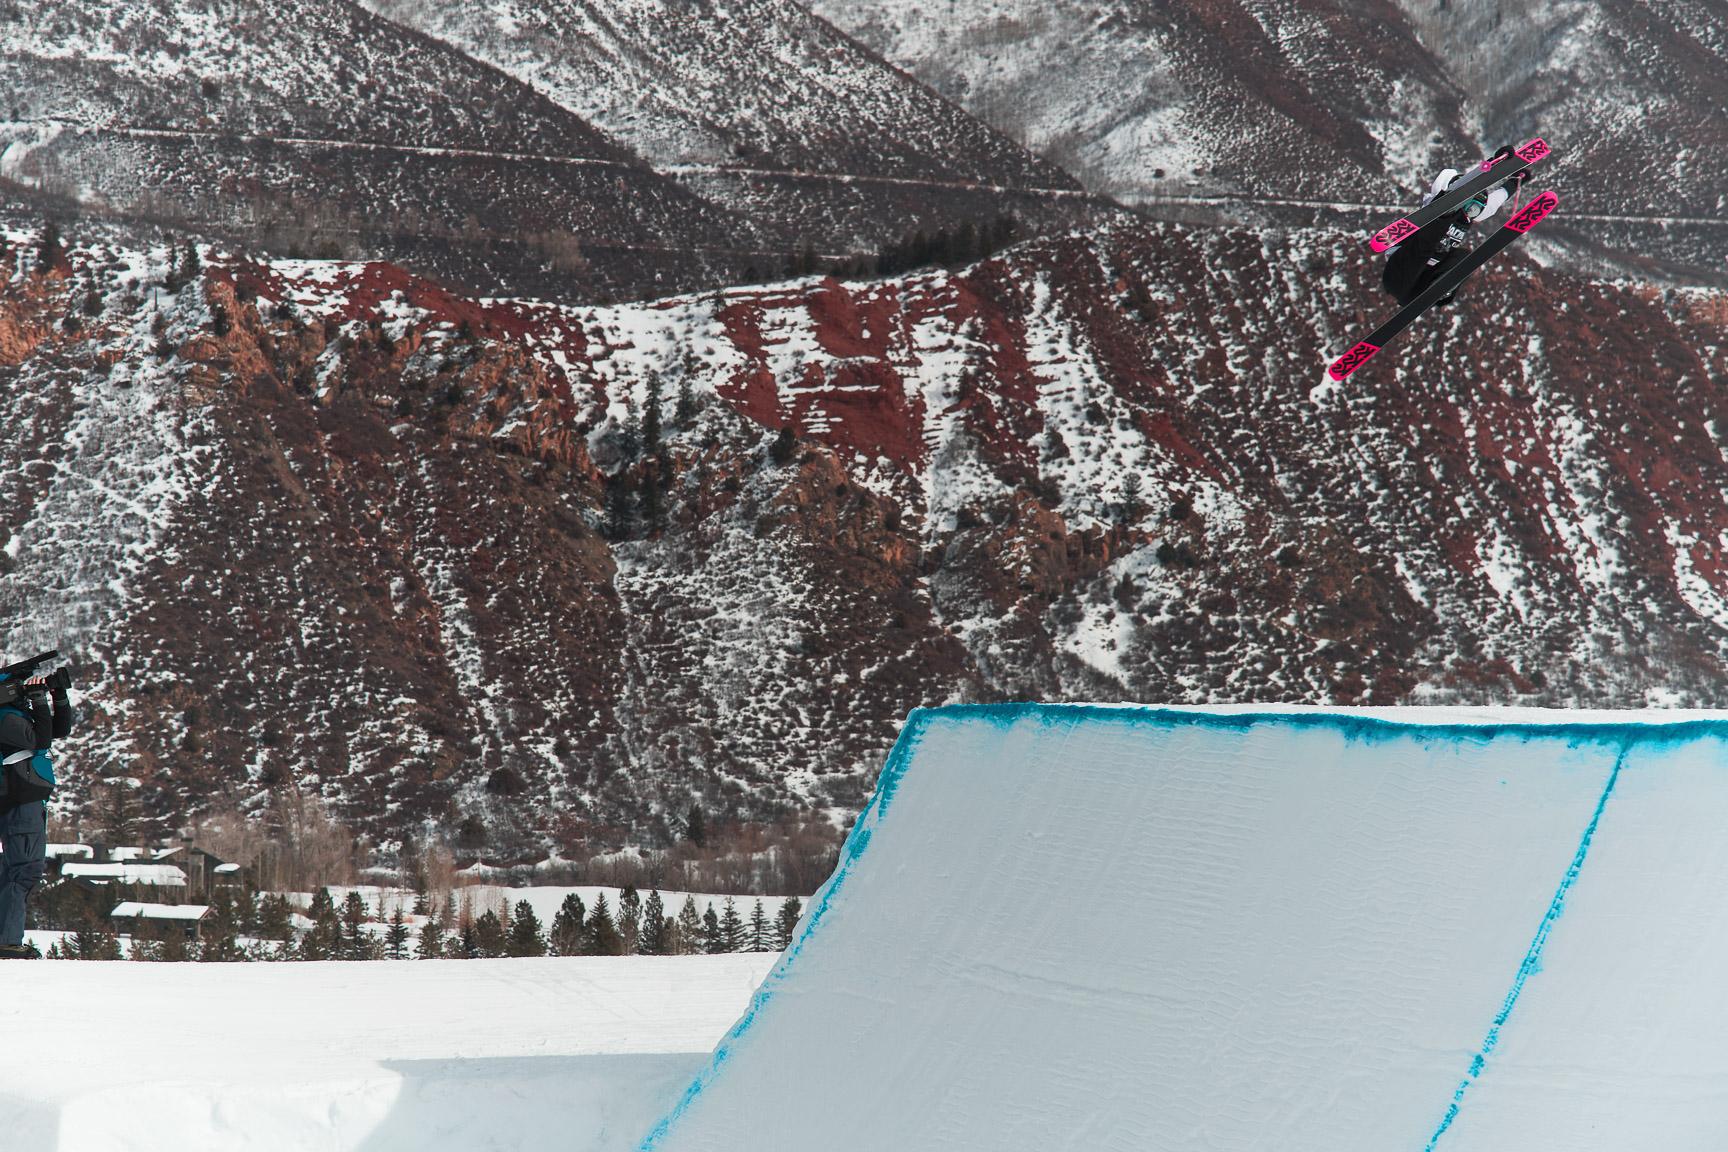 Maggie Voisin, W Ski Slopestyle